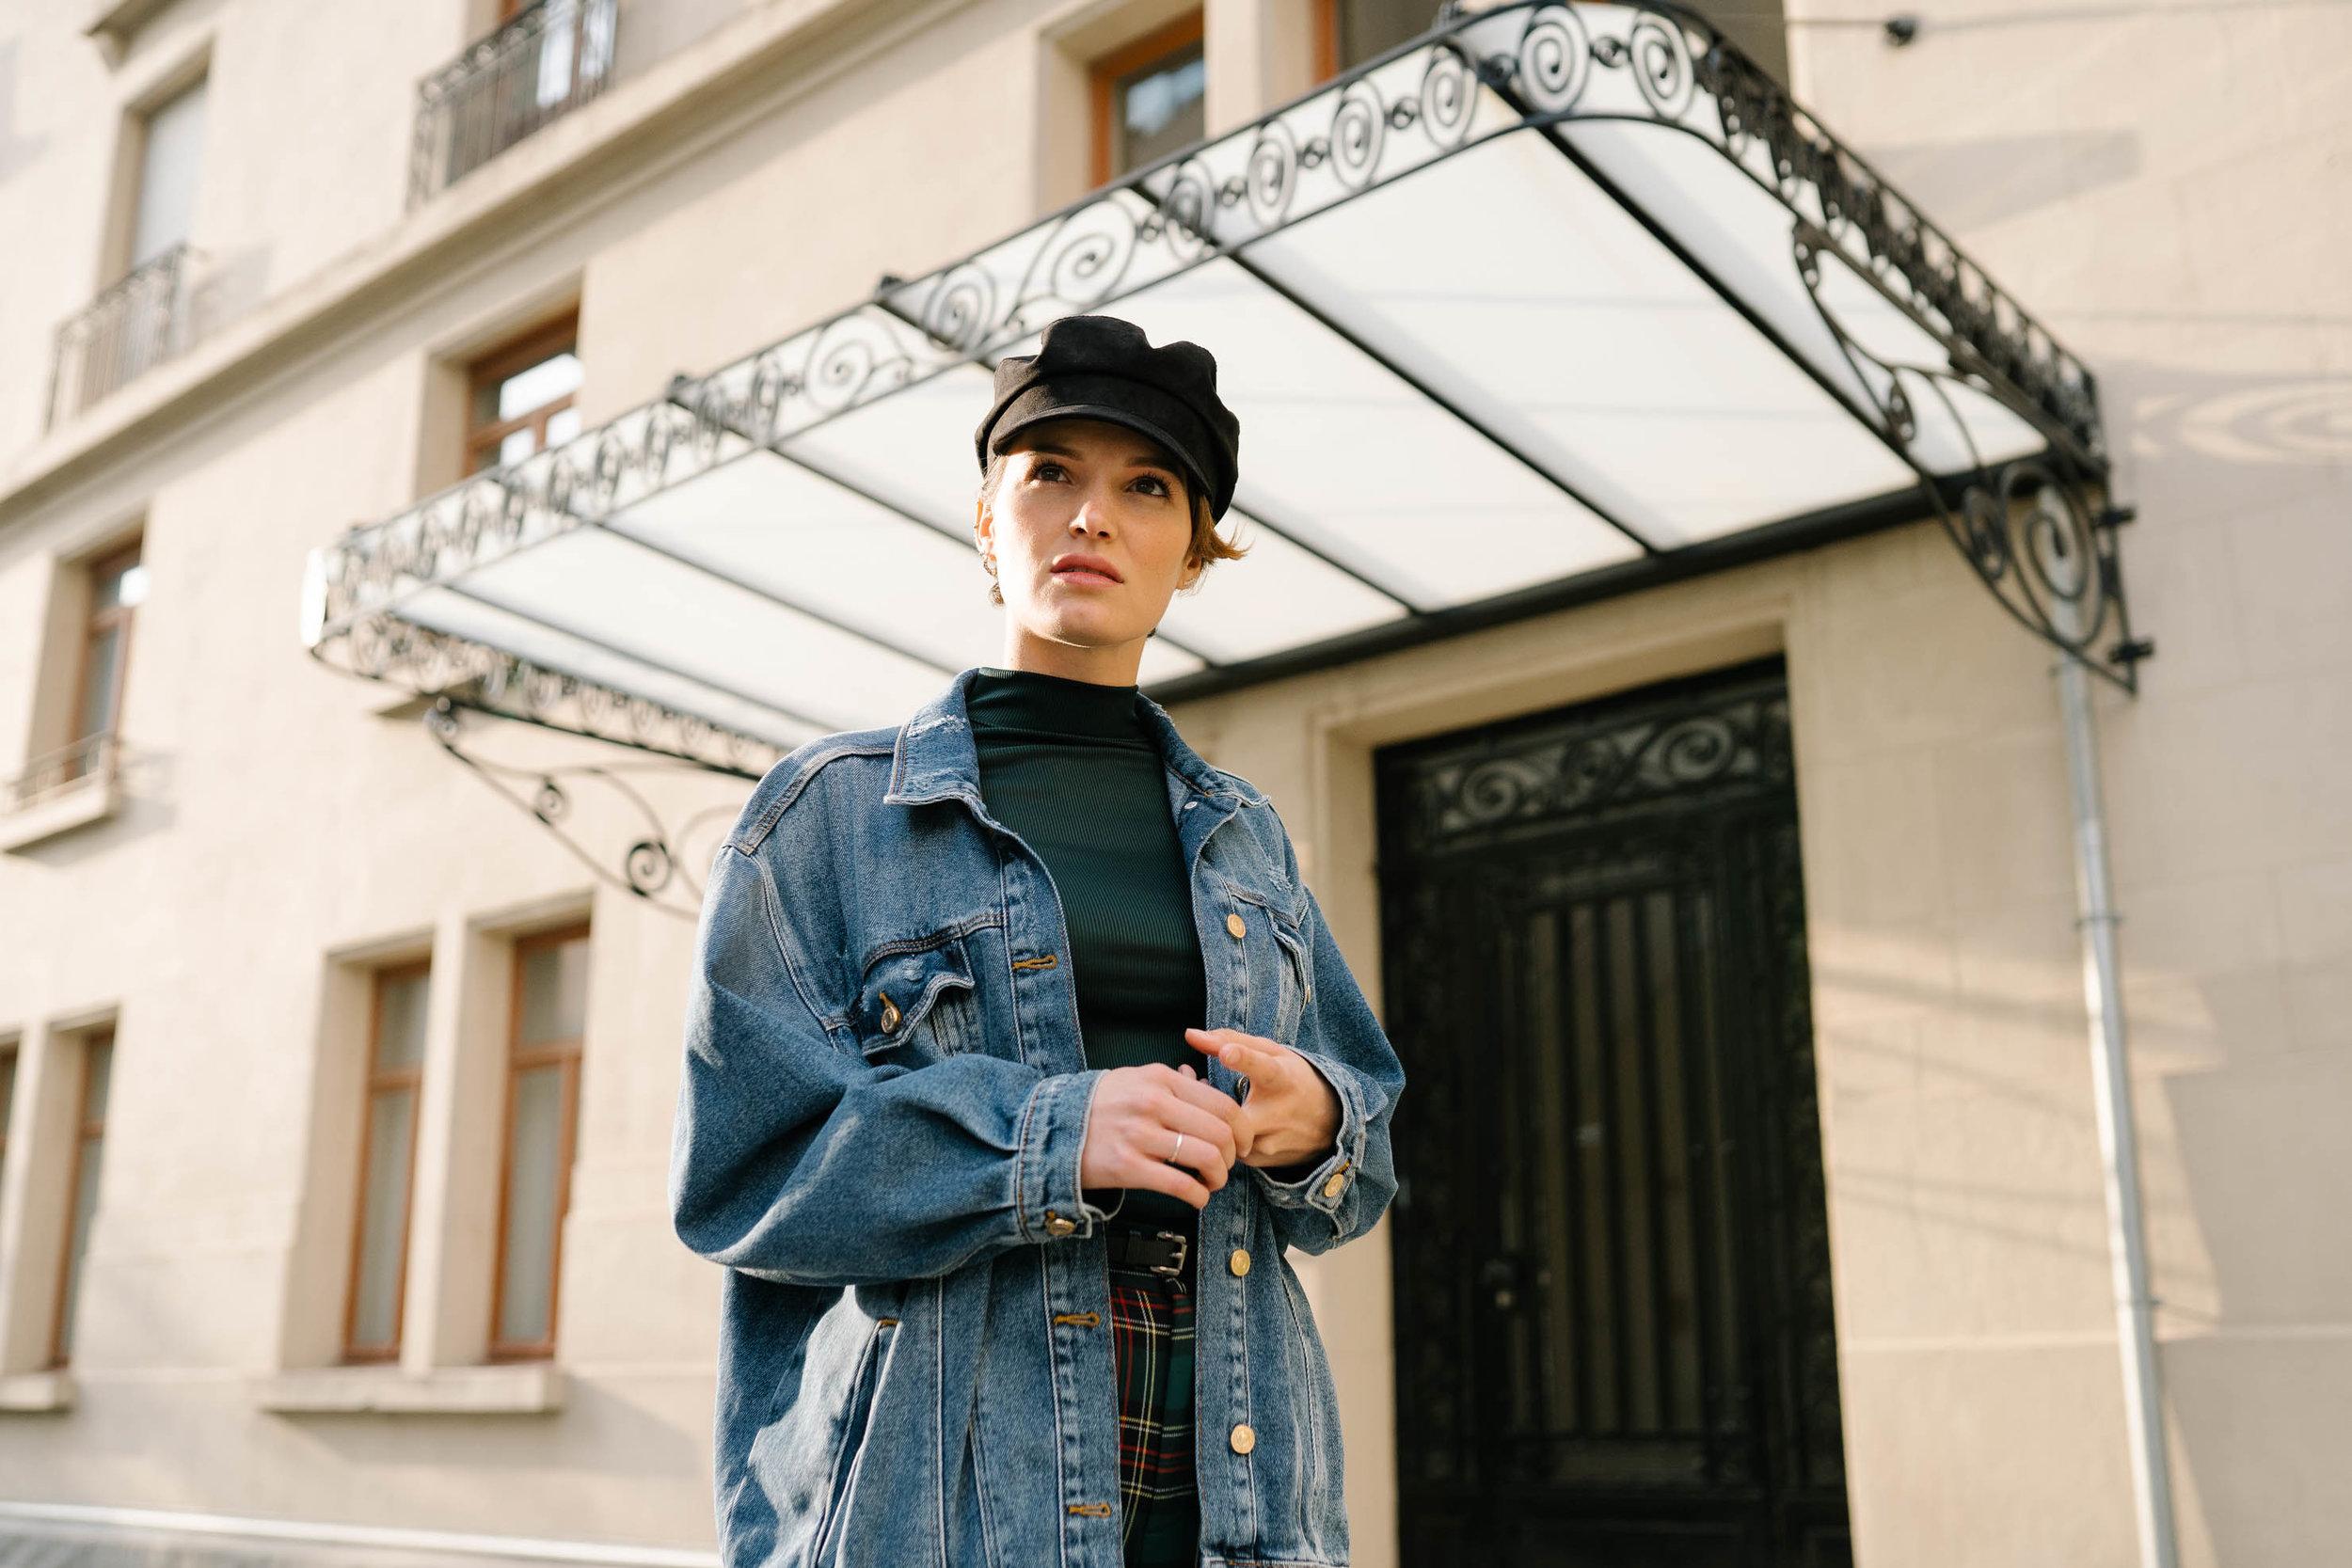 Amelia-portrait-photographe-videaste-bruxelles-38.jpg